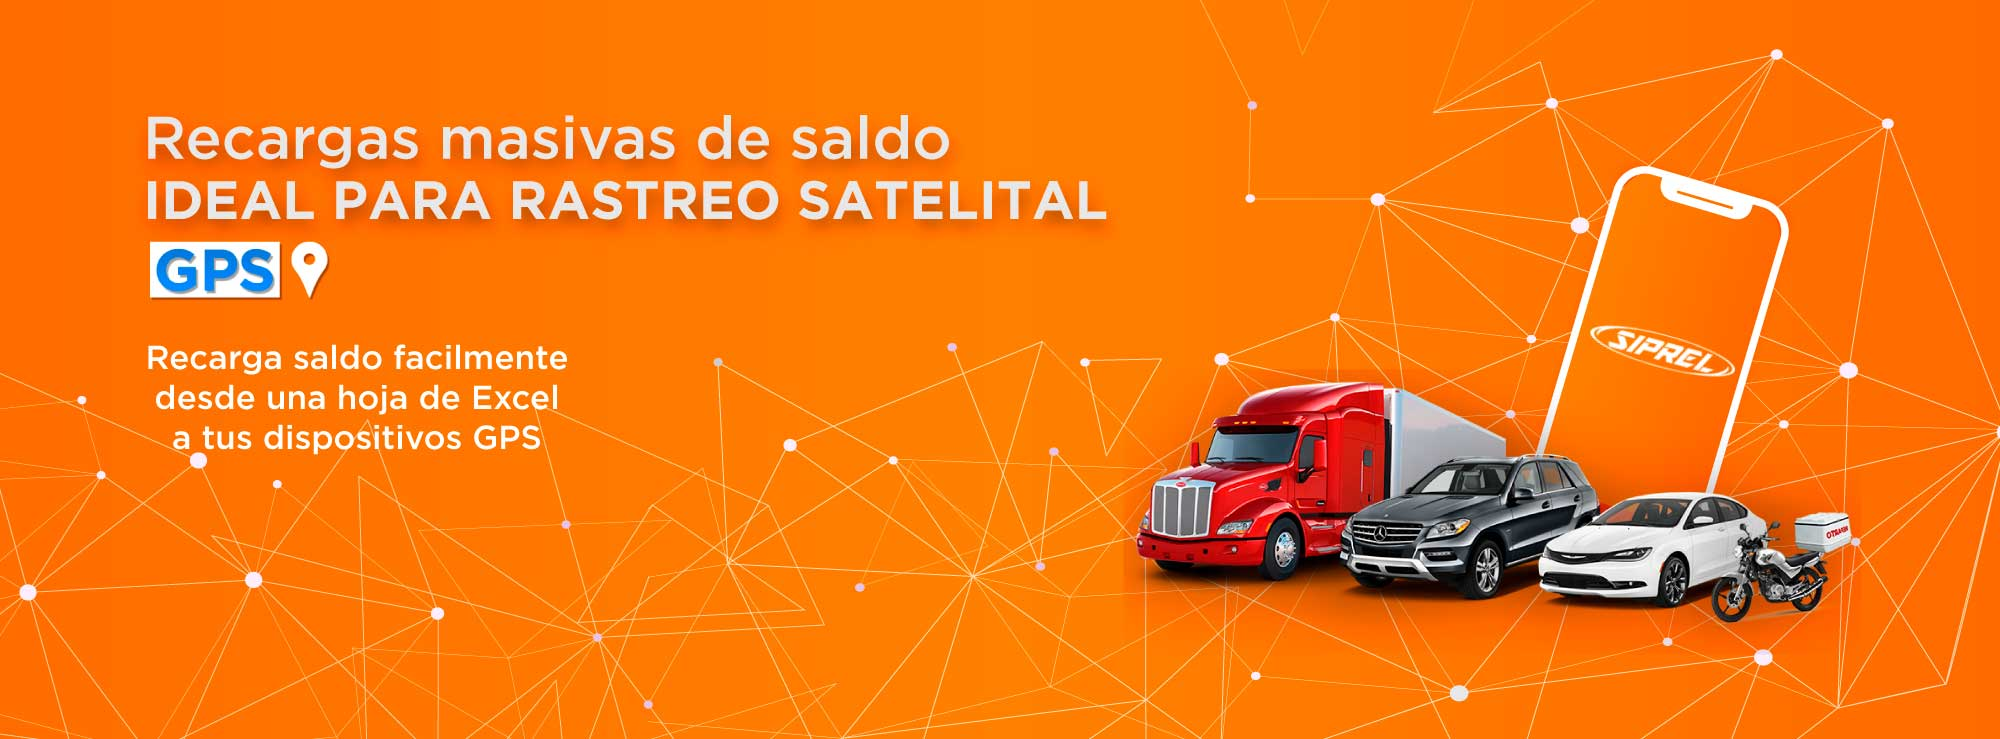 Con SIPREL Vende multirecargas de tiempo aire de todas las compañias celulares en México Recargas Telcel, Sistema de recarga masiva de saldo para celular ideal para empresas de geolocalización y rastreo GPS , para todas las compañias de telefonia celular en México, recarga chips GPS